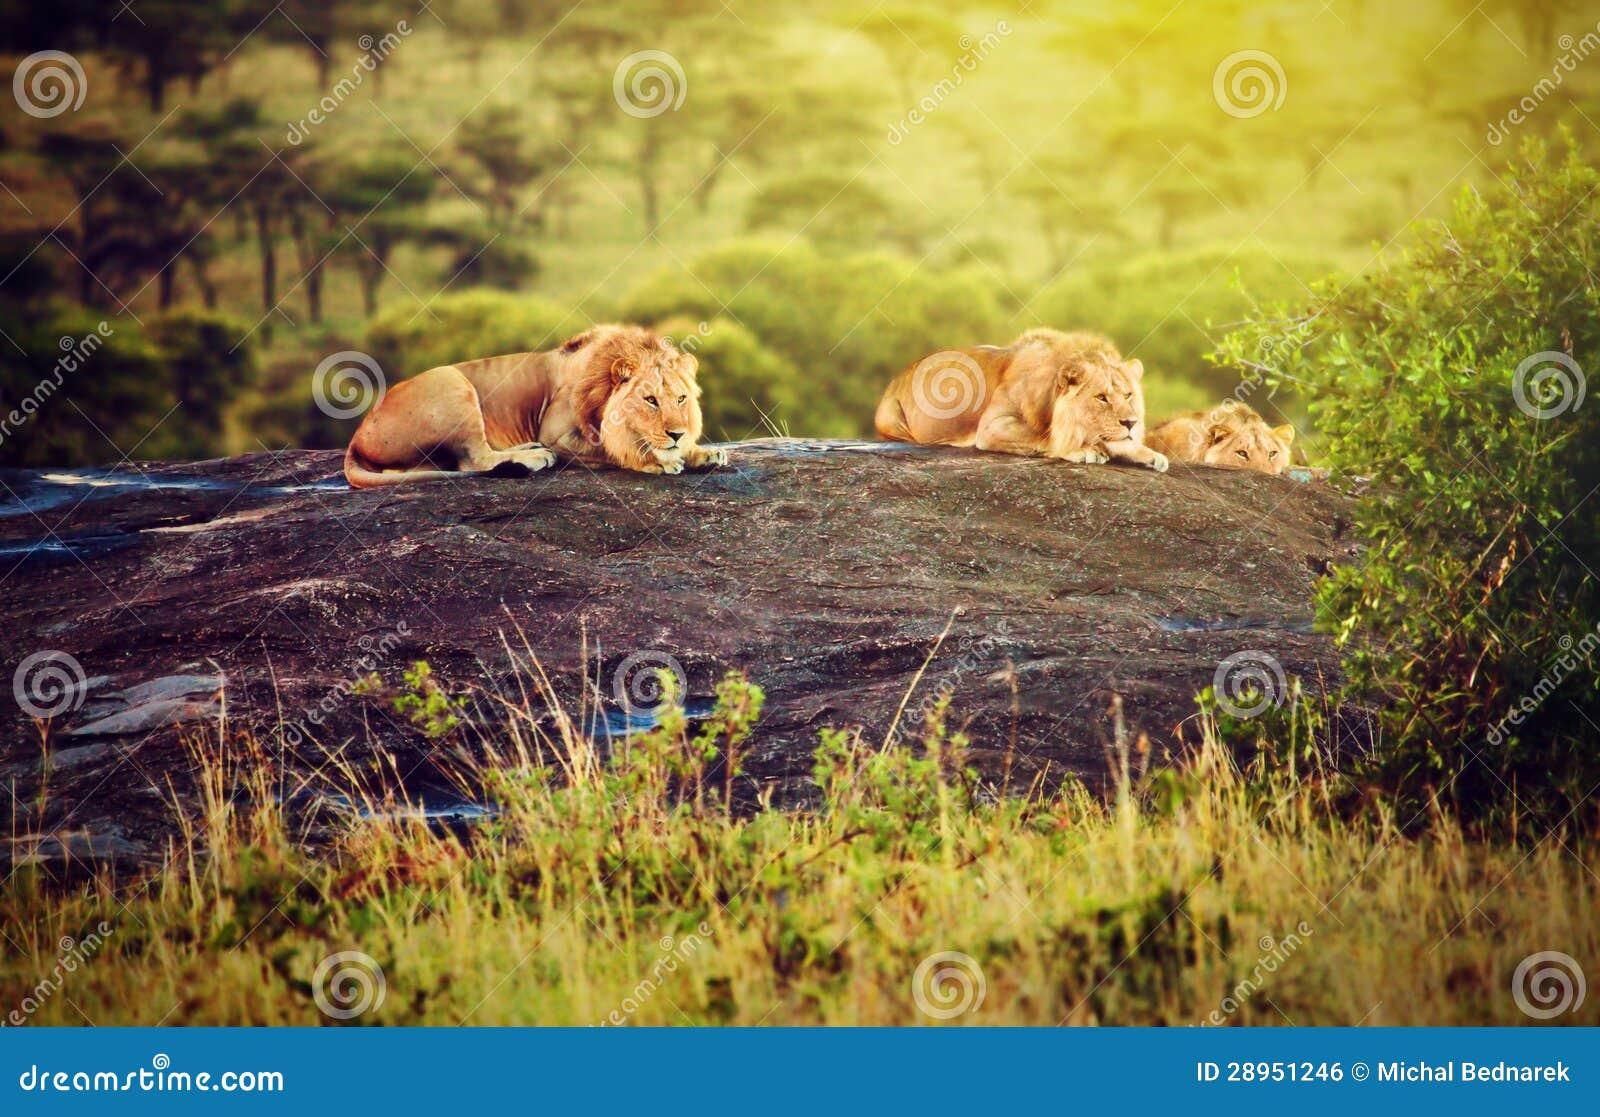 Leeuwen op rotsen op savanne bij zonsondergang. Safari in Serengeti, Tanzania, Afrika